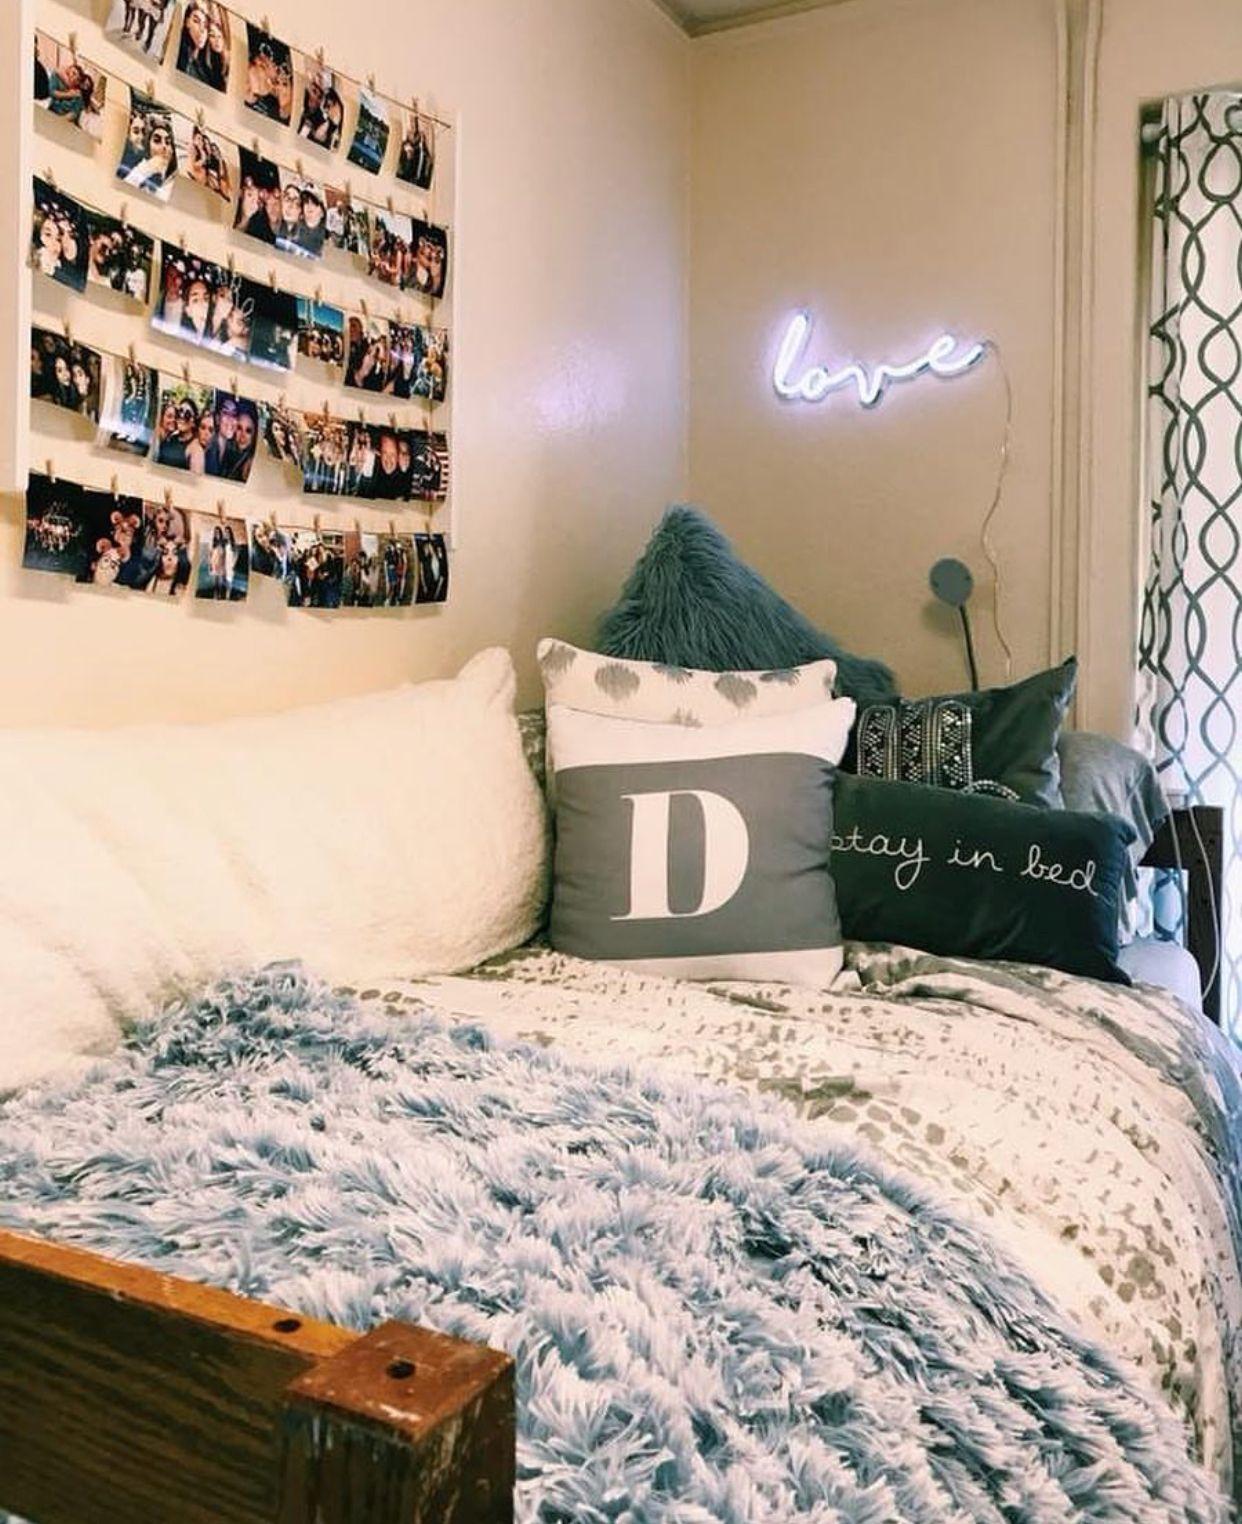 Pin By E L L A On Home Decor ;) In 2019